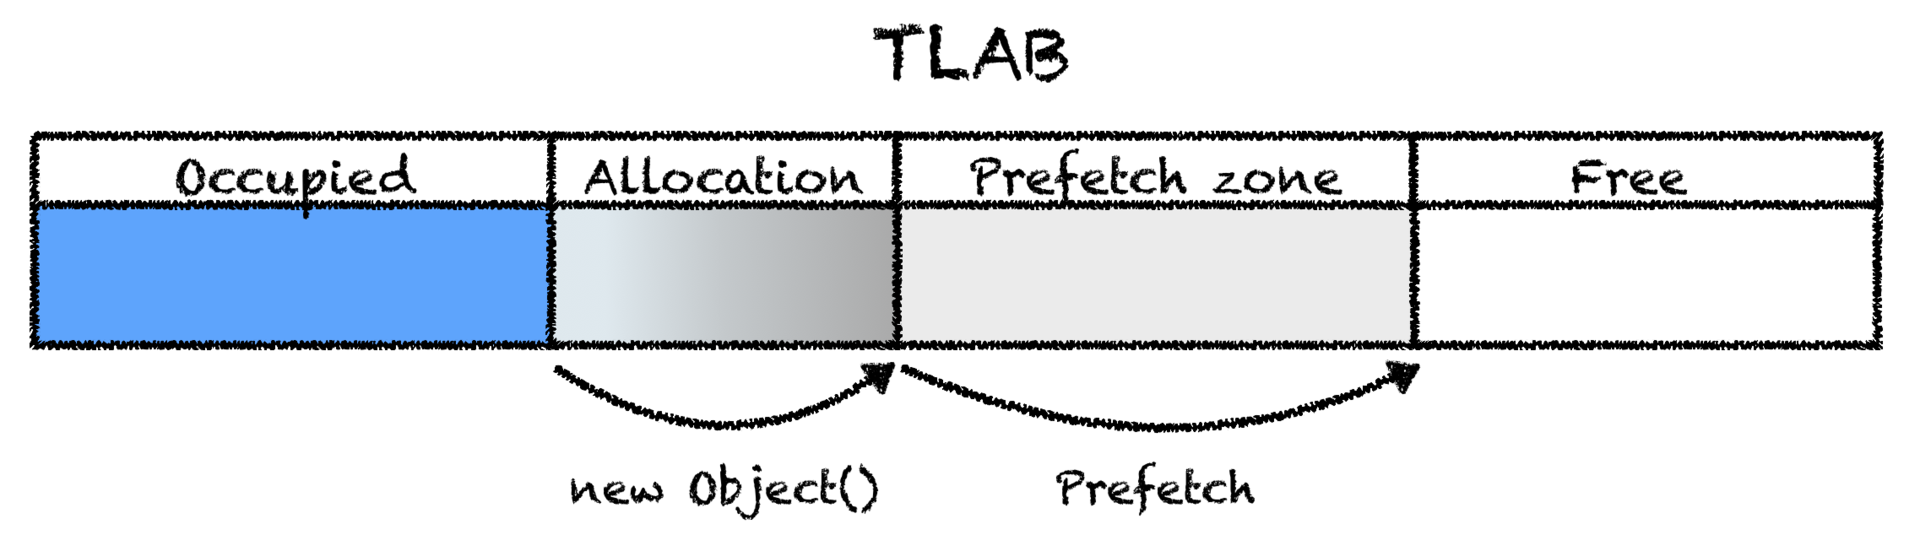 Как JVM аллоцирует объекты? - 6